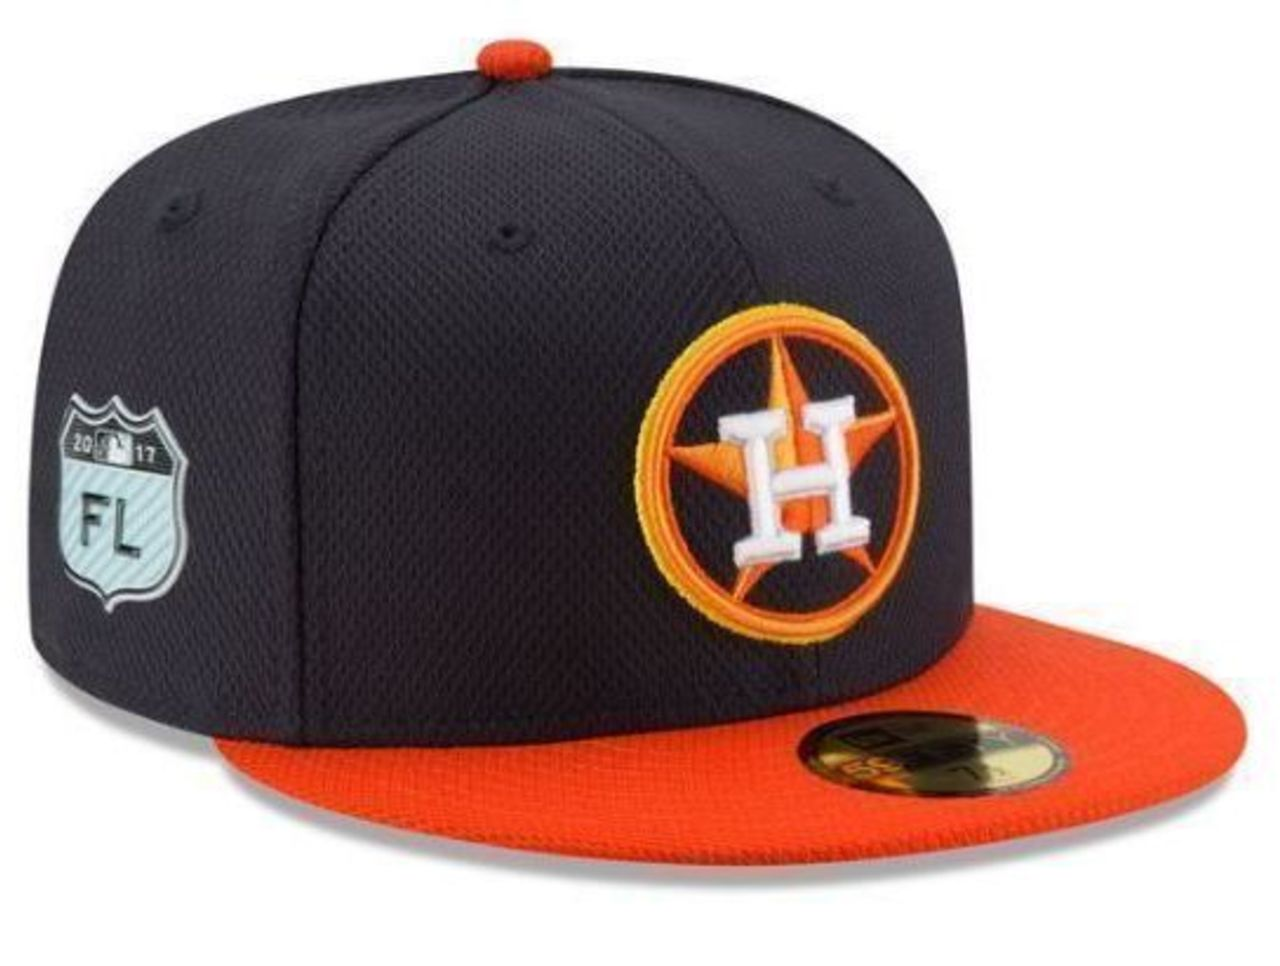 Kansas City Royals Spring Training Hat Hat